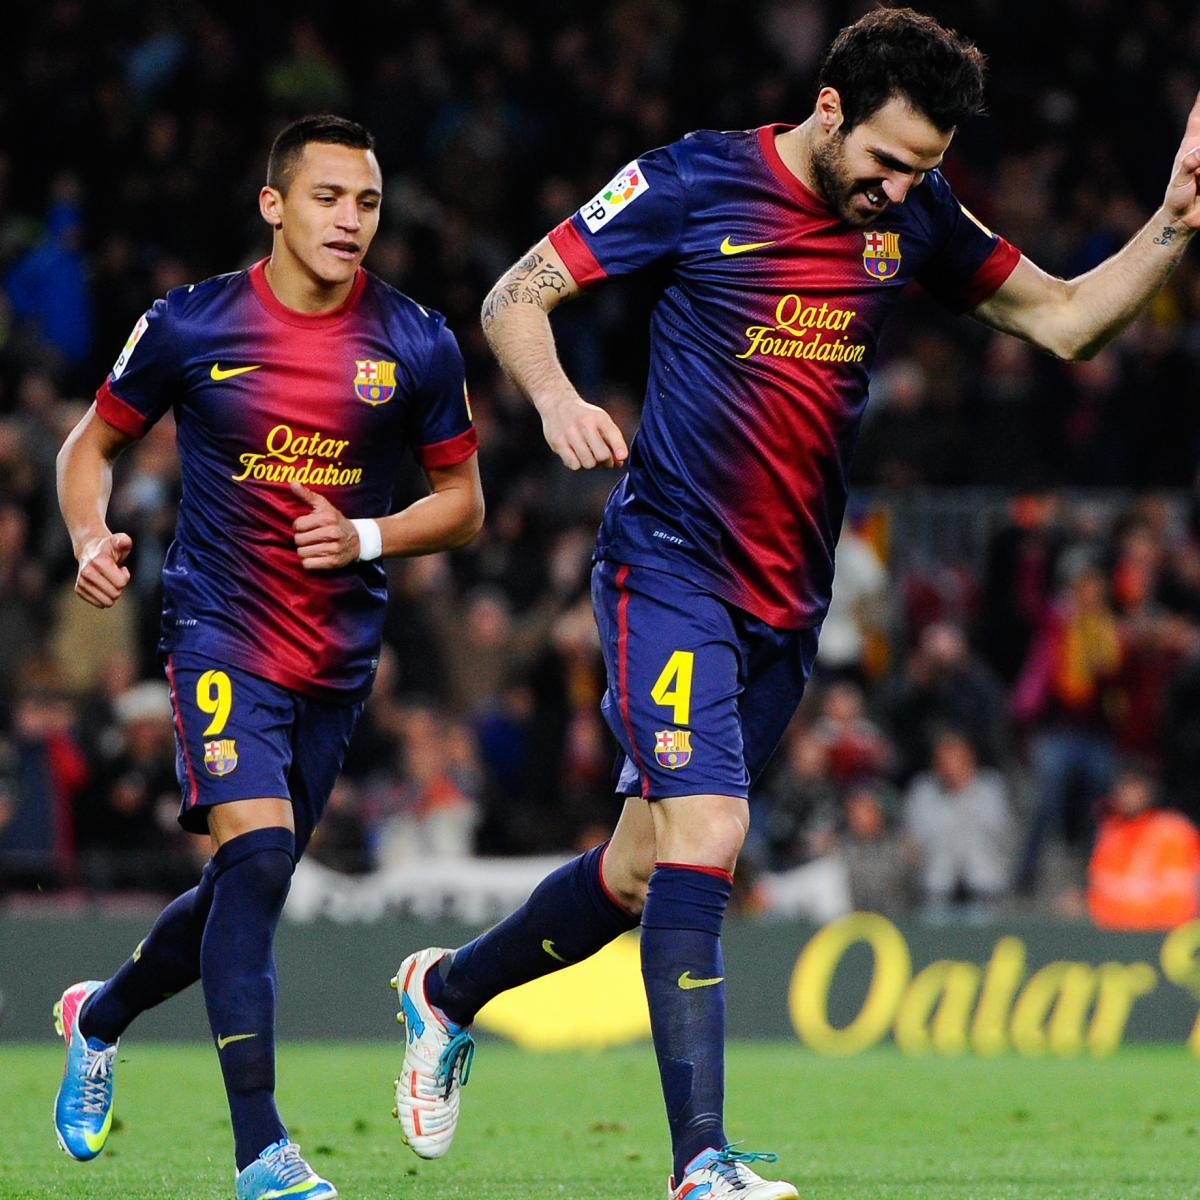 Psg Vs Chelsea Live Score Highlights From Champions: Barcelona Vs. PSG: Complete Champions League Quarterfinal